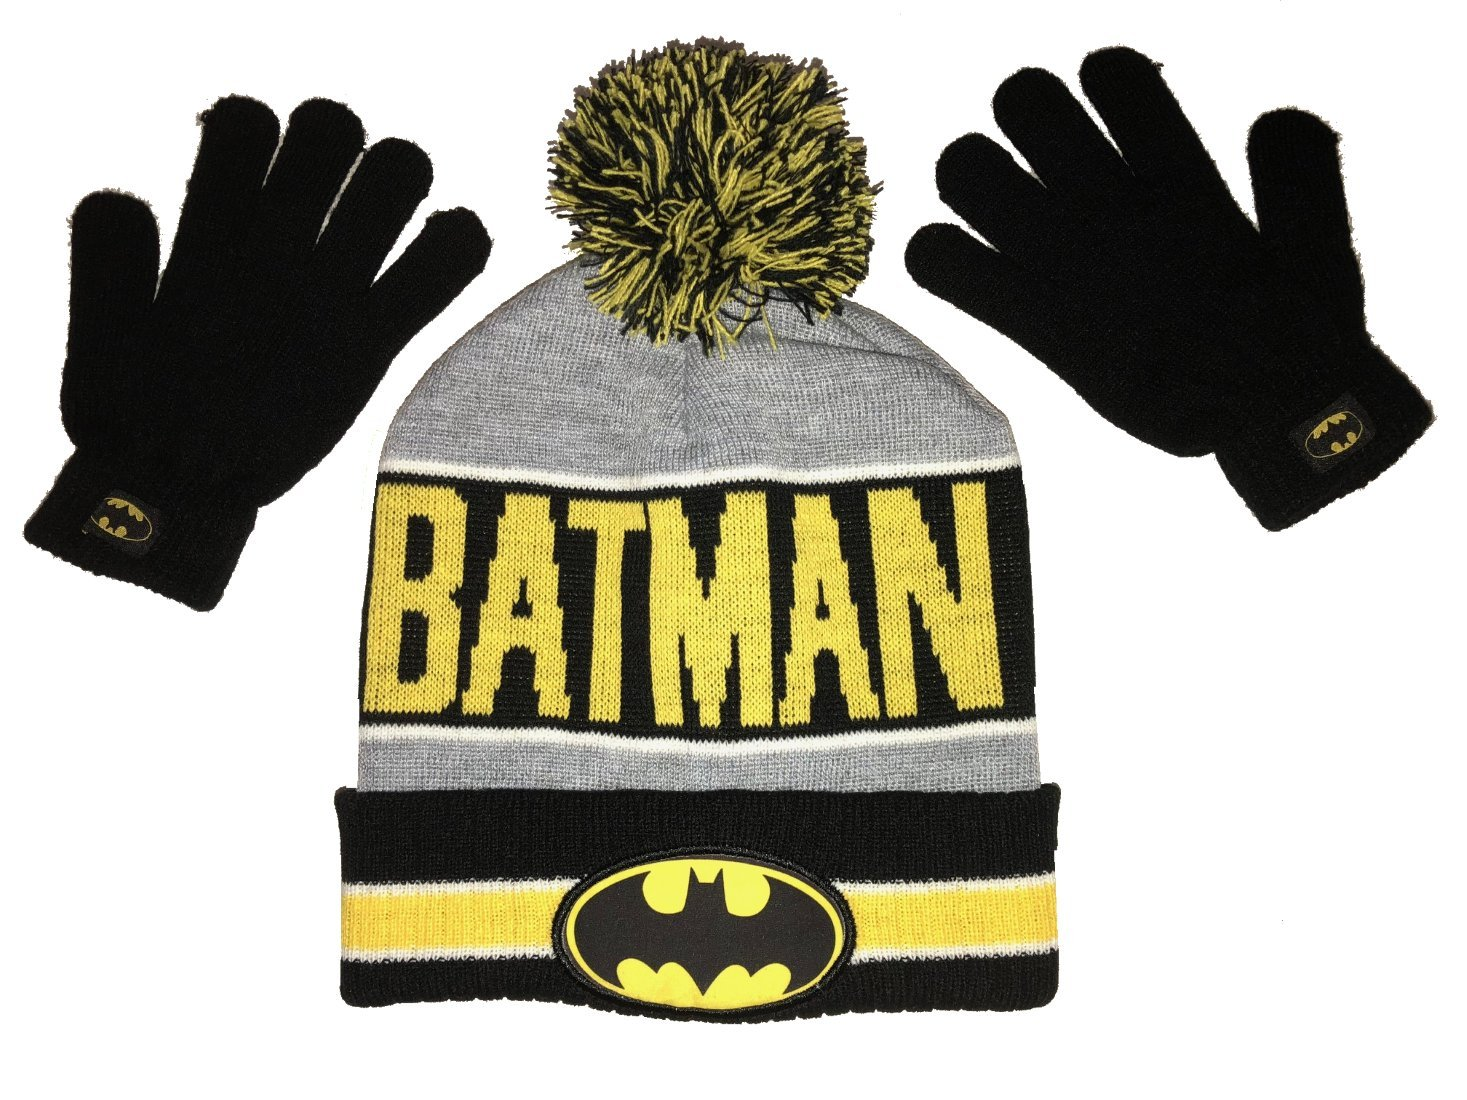 DC Comics BATMAN Knit Winter Knit Hat and Gloves Set One Size